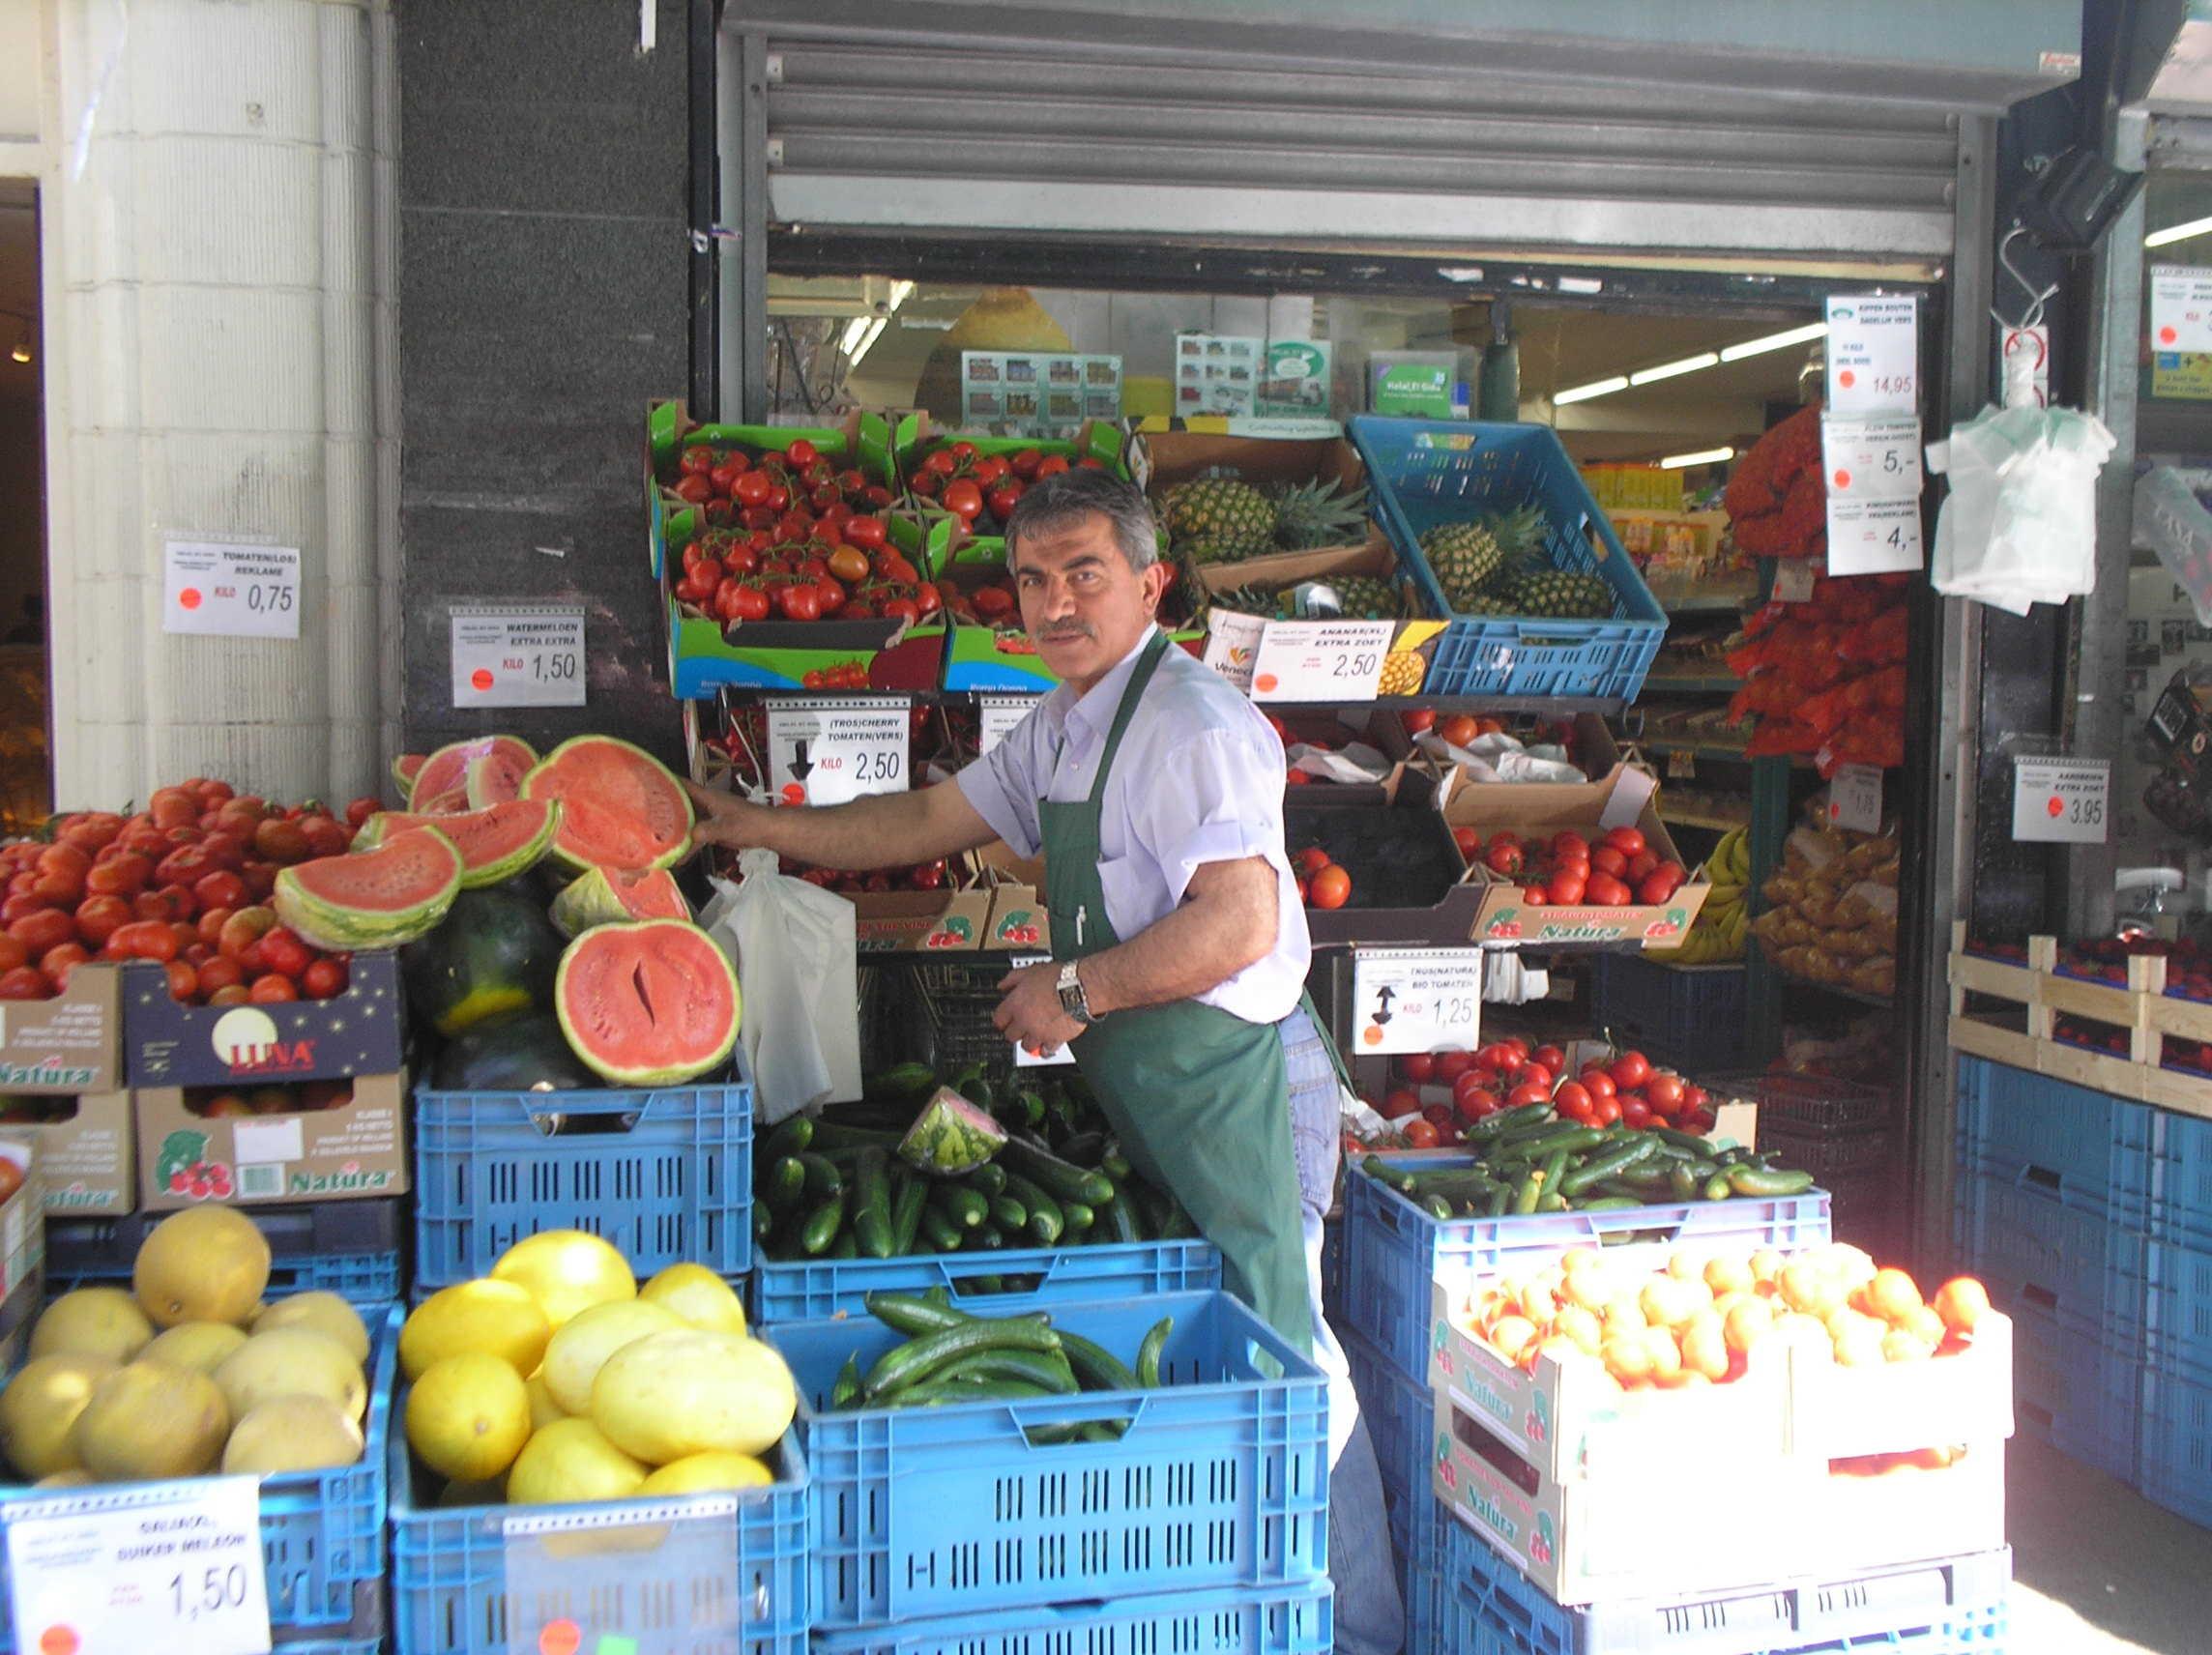 Turkse supermarkt geheugen van oost for Turkse kapper amsterdam oost